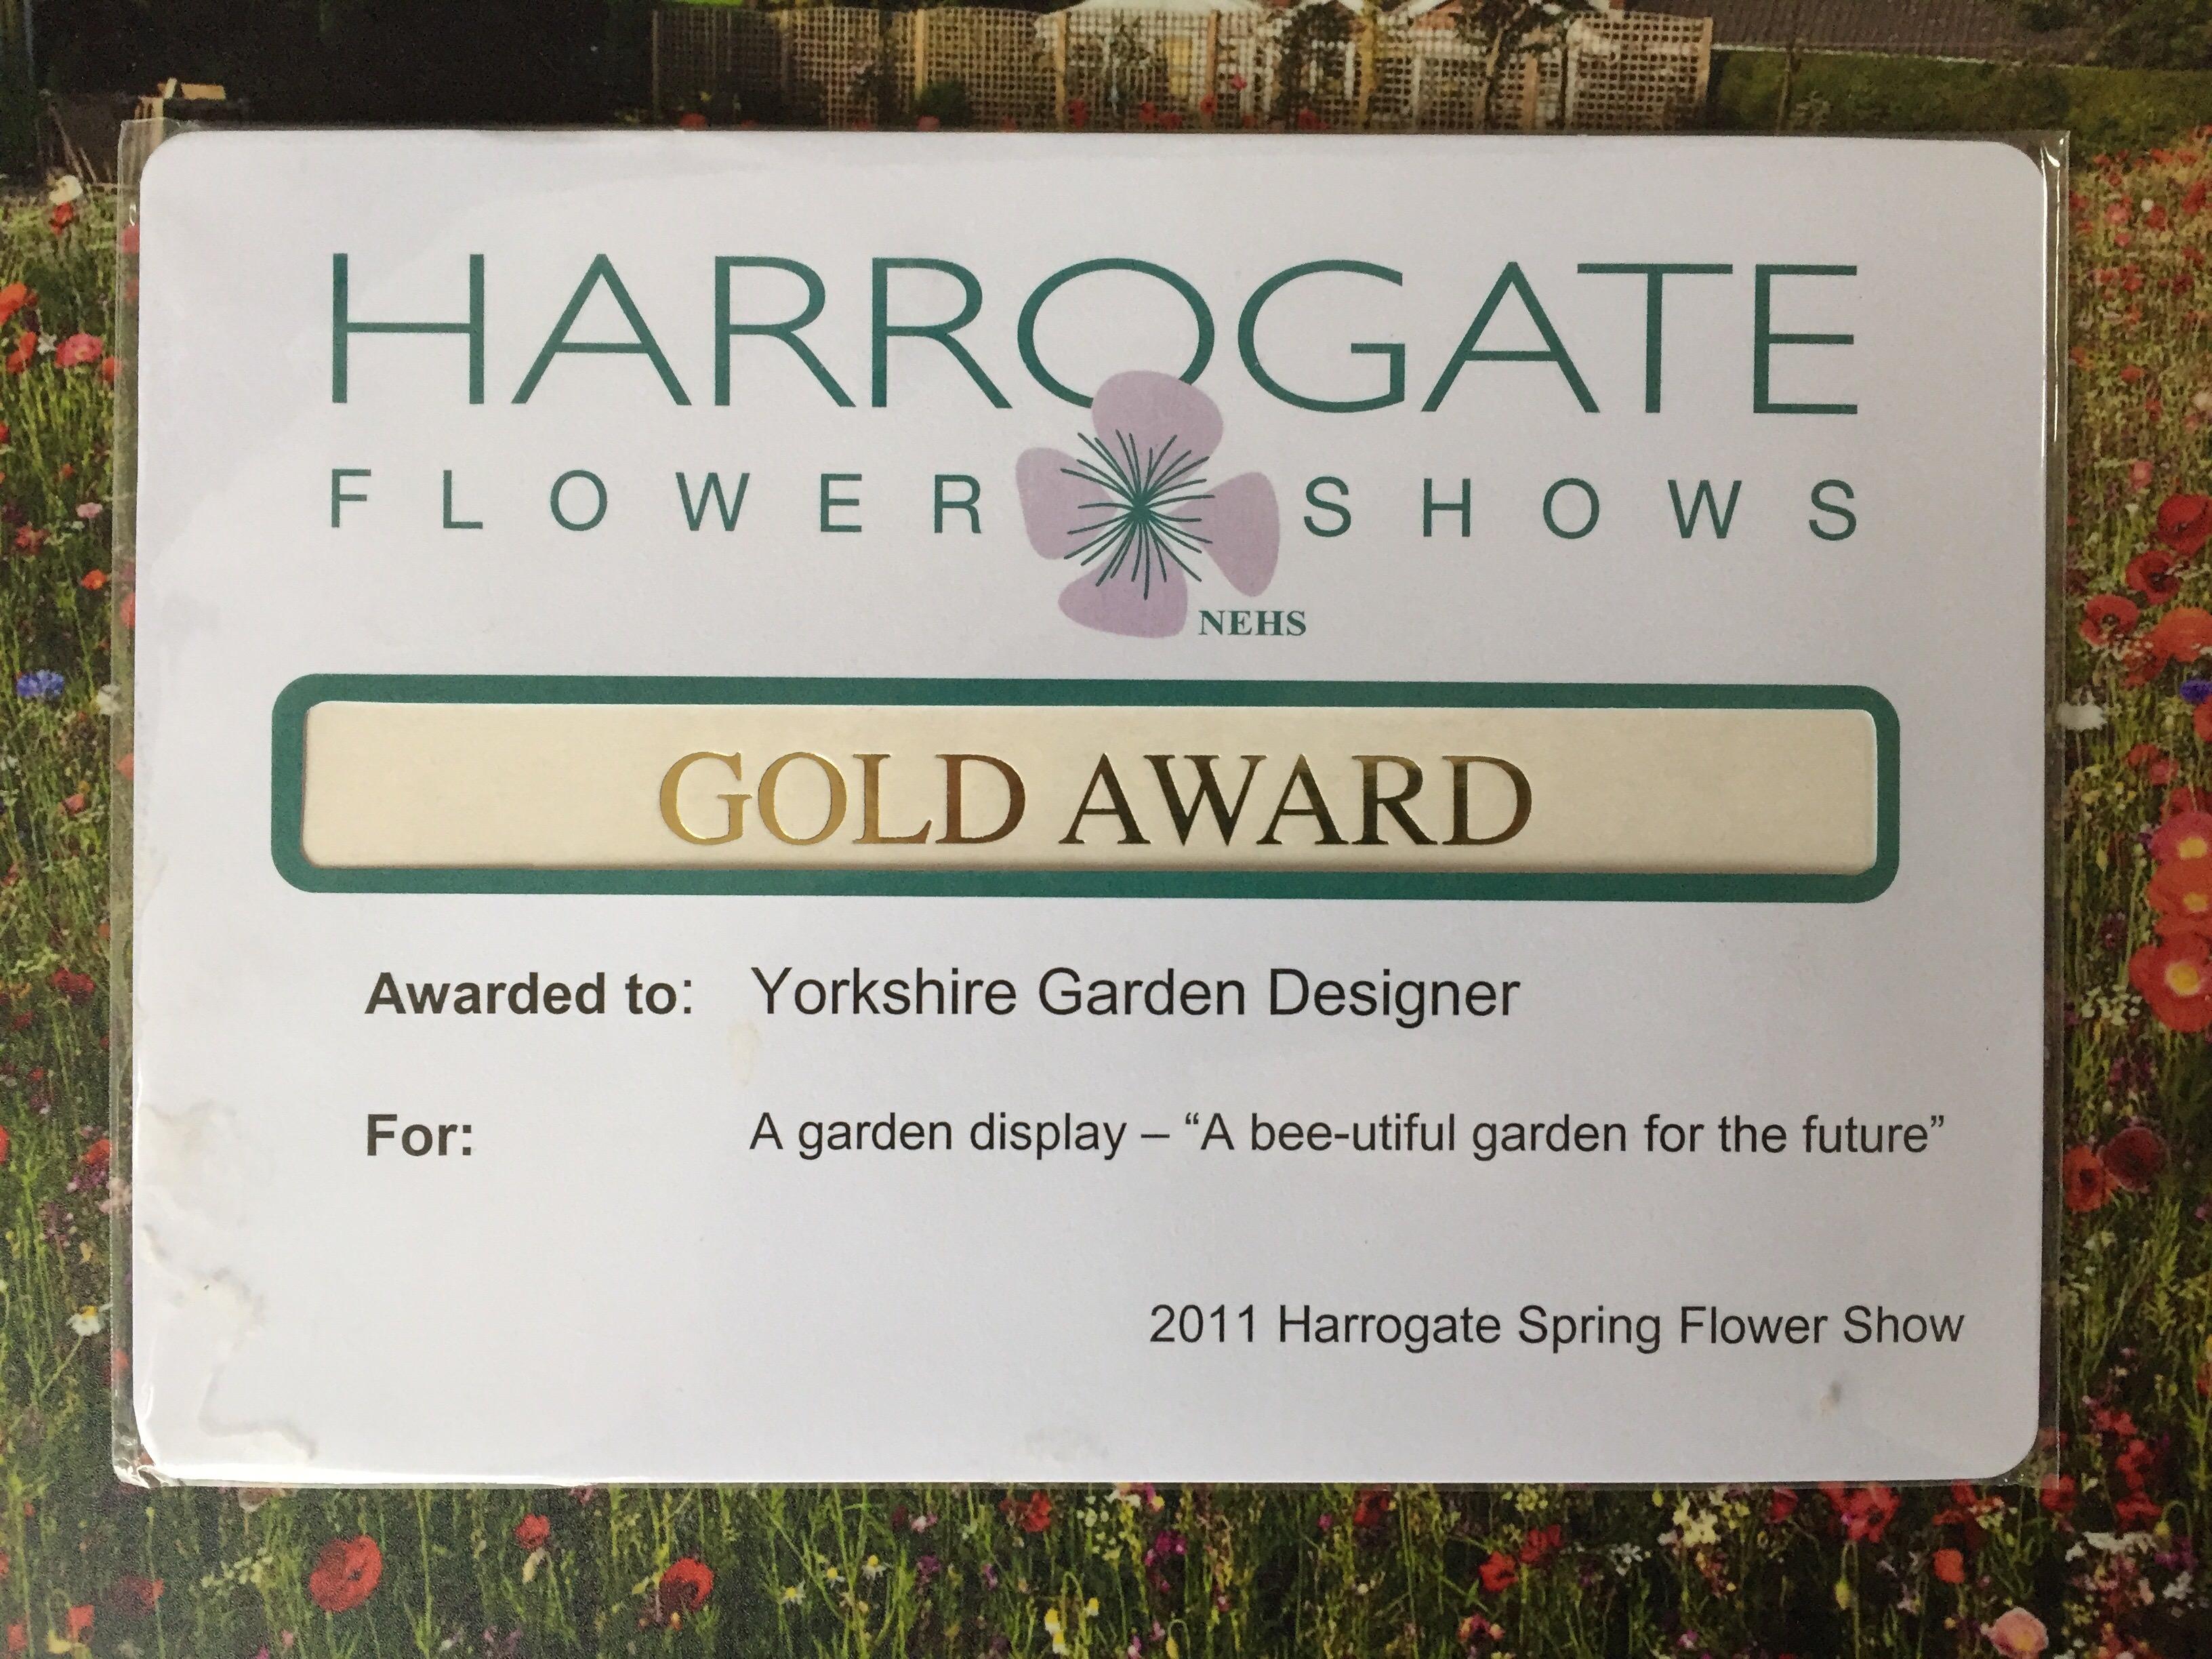 Harrogate Flower Show 2011